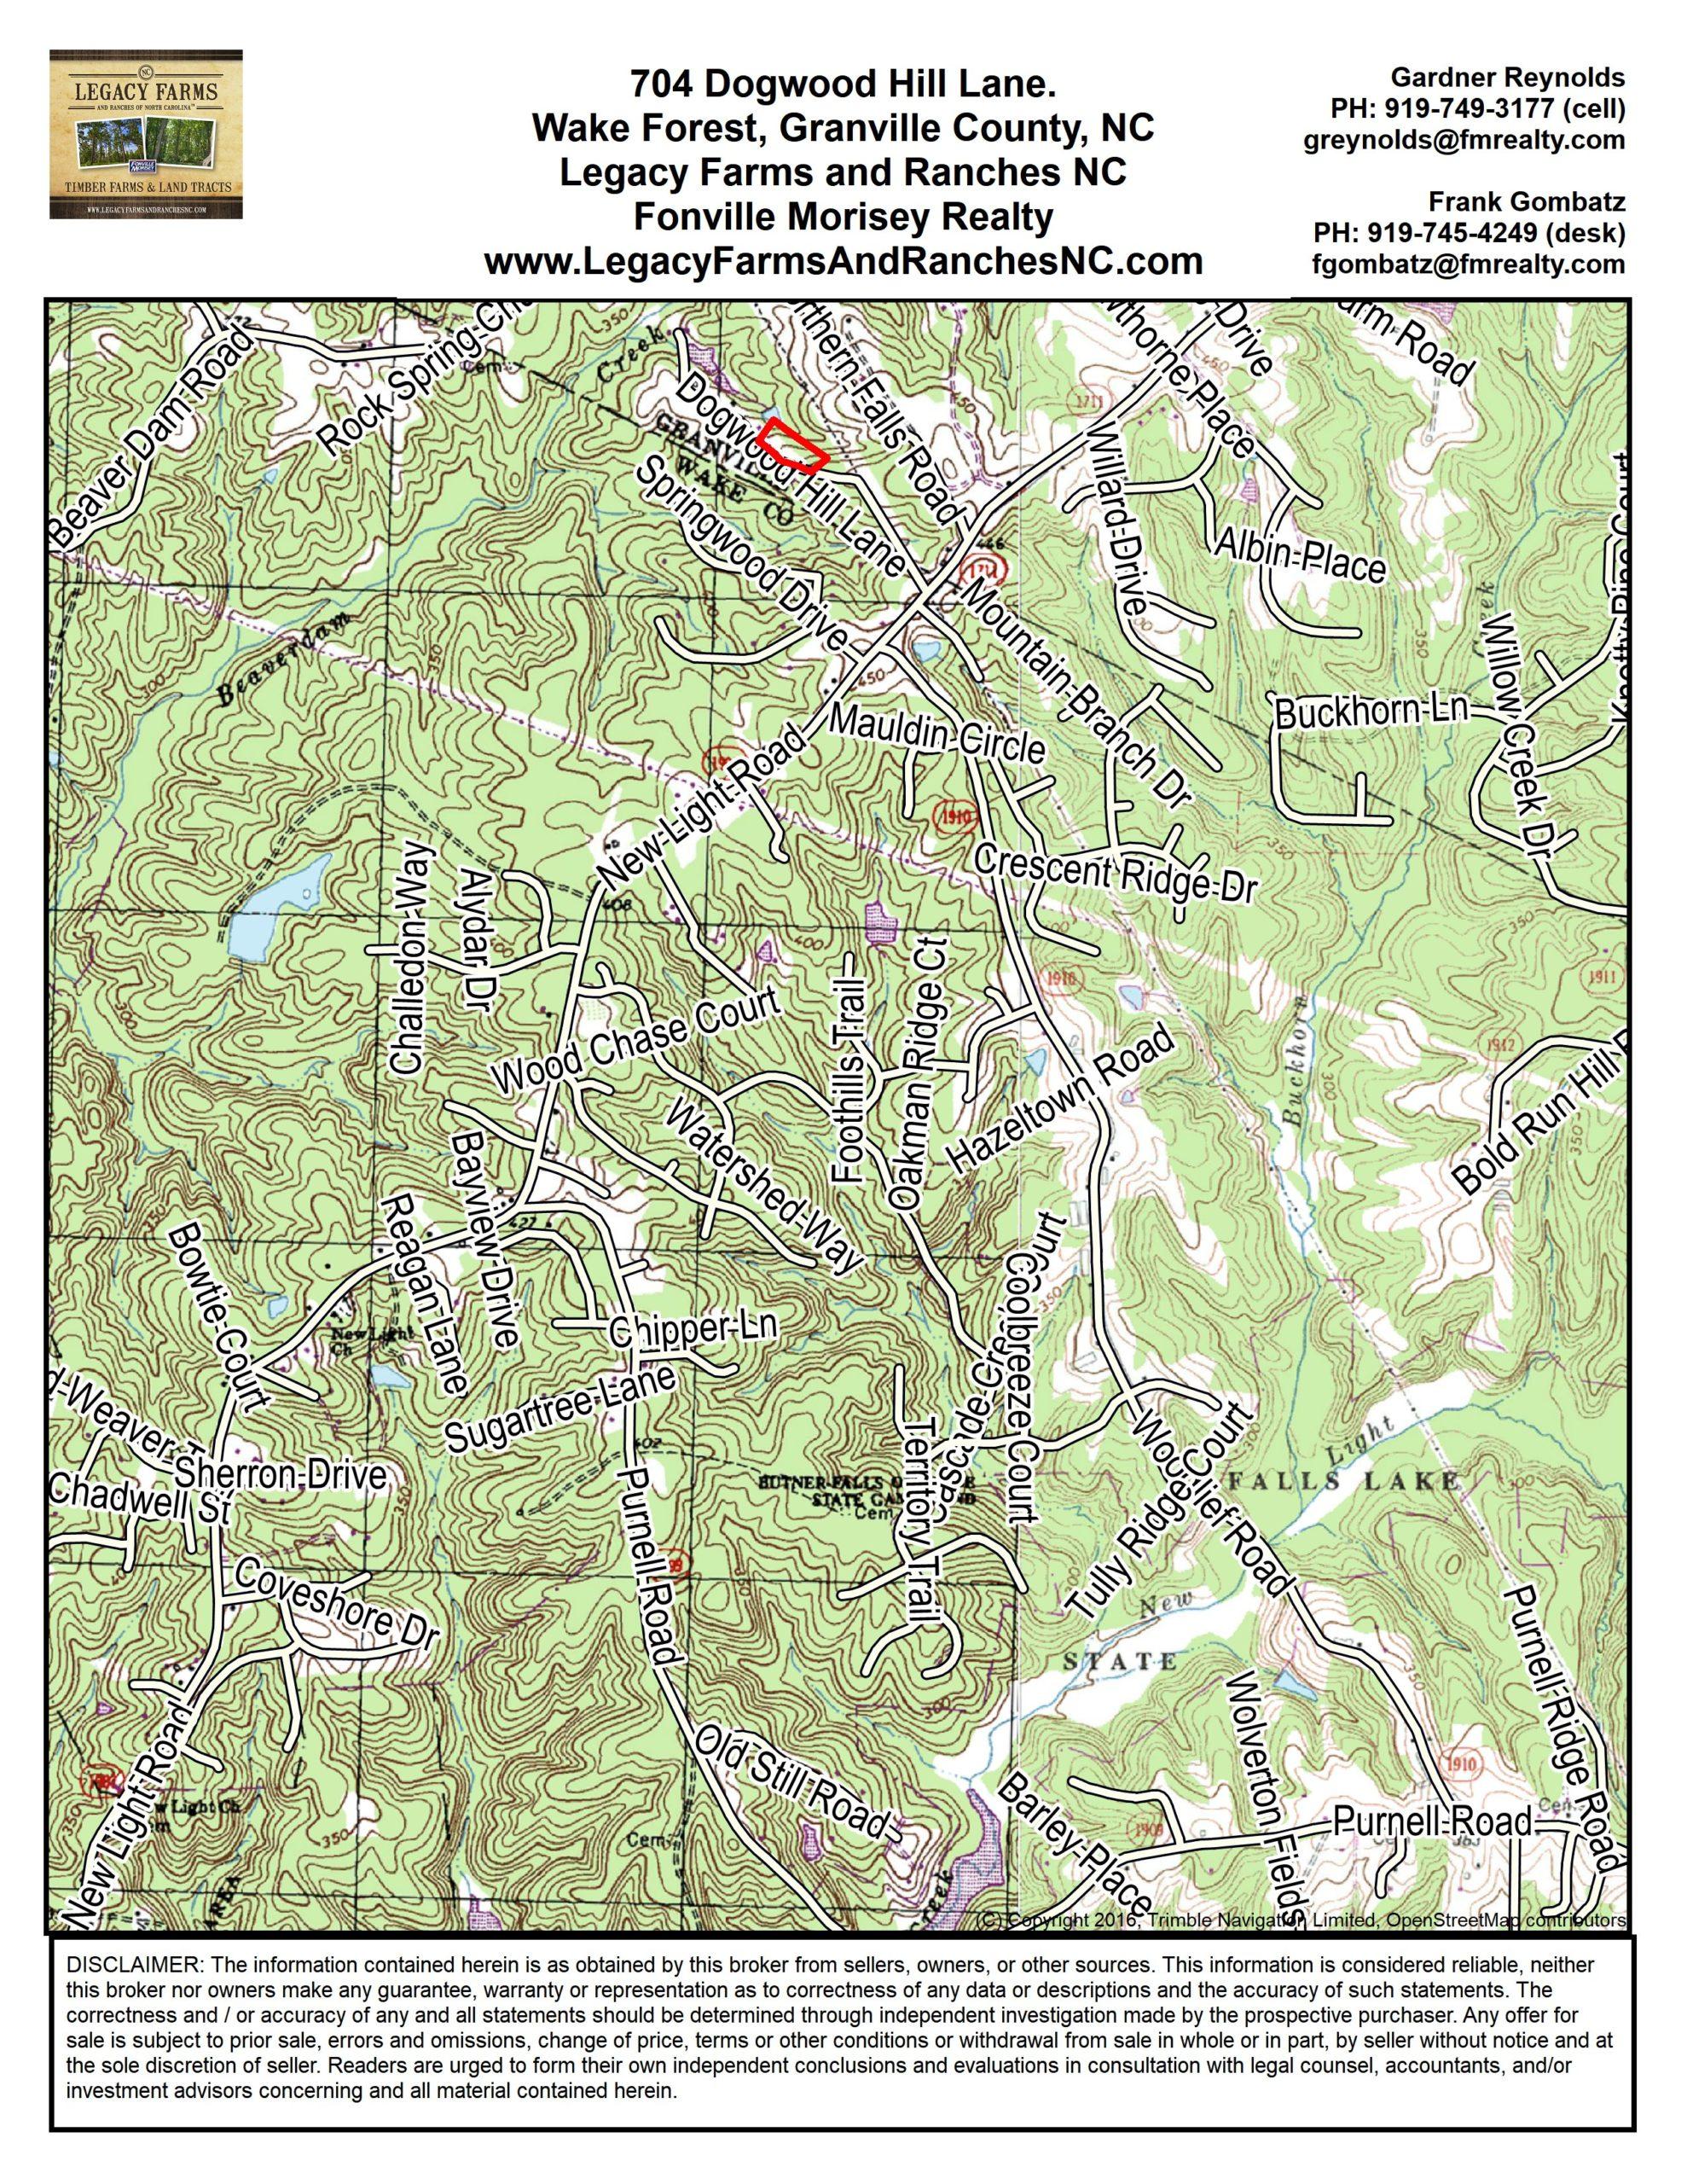 704 Dogwood Hill Lane, Wake Forest NC 27587 Location